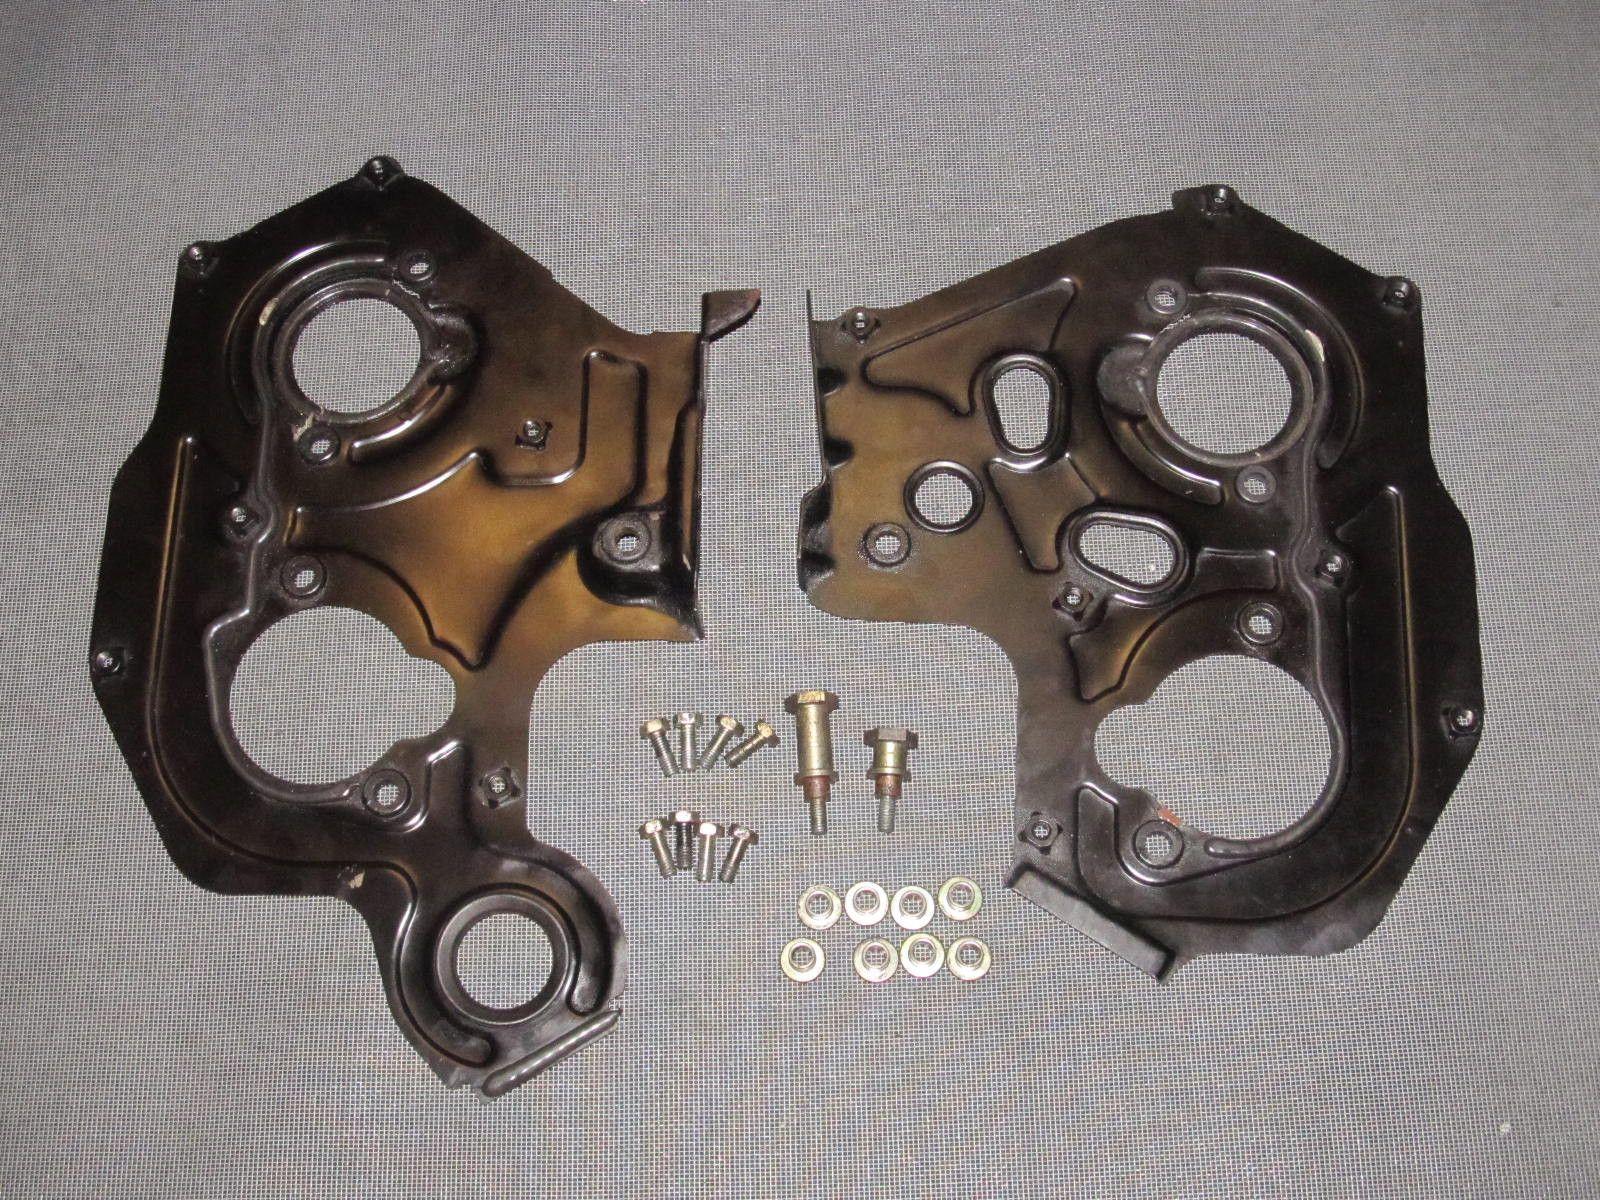 90 91 92 93 94 95 96 Nissan 300zx Oem Timing Belt Rear Cover Set